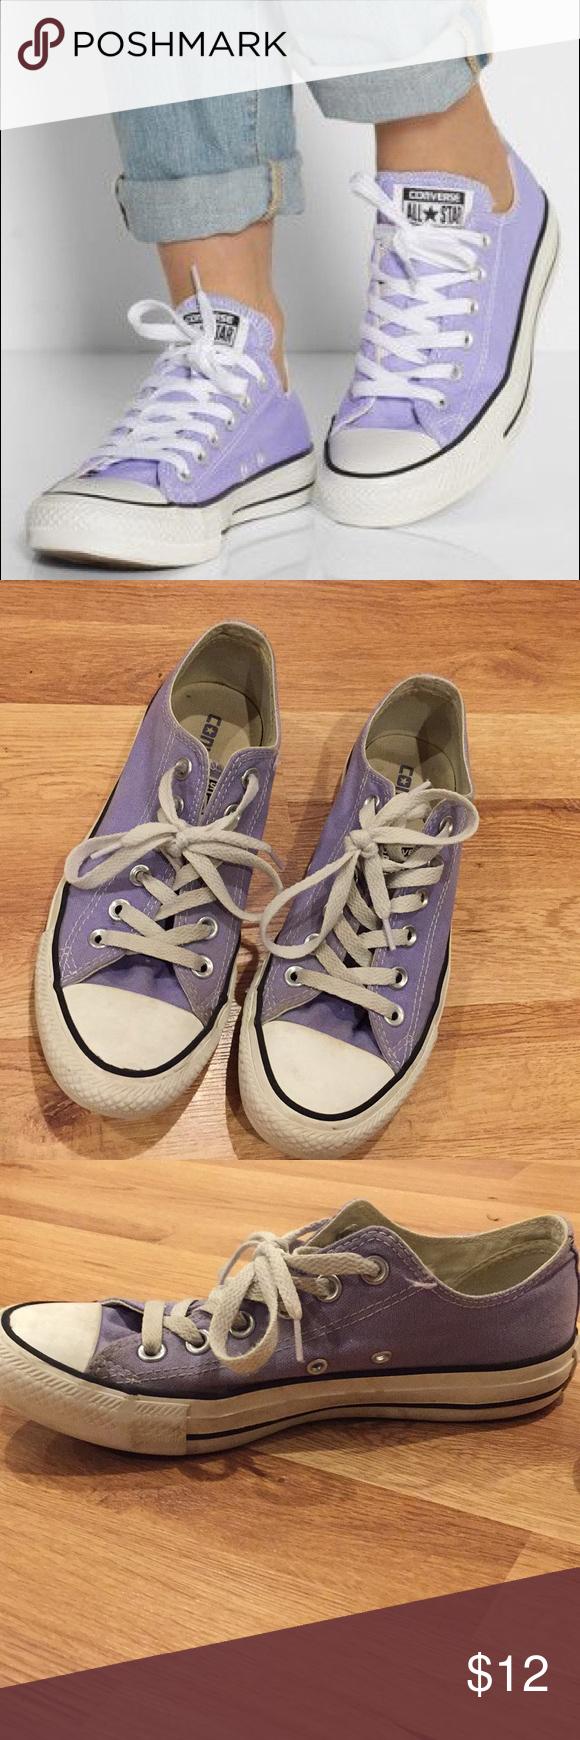 71cc429ceeff All-Star CONVERSE Light Purple Size 7 Light purple converse! Size 7 US  women s